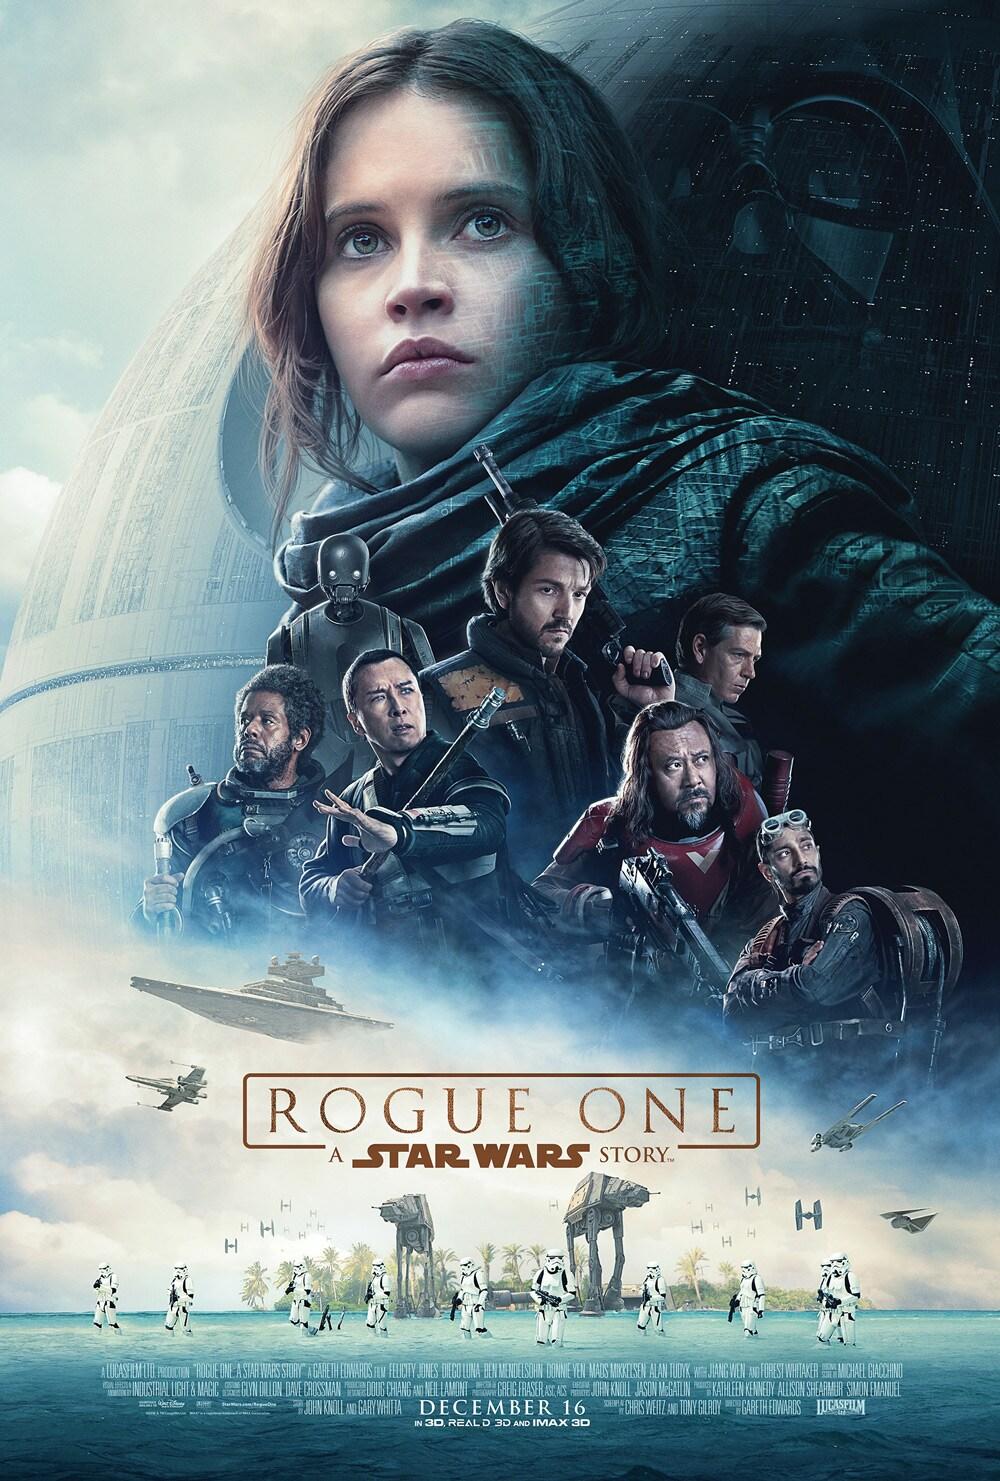 Star Wars: The Last Jedi (English) full movie 1080p download utorrent